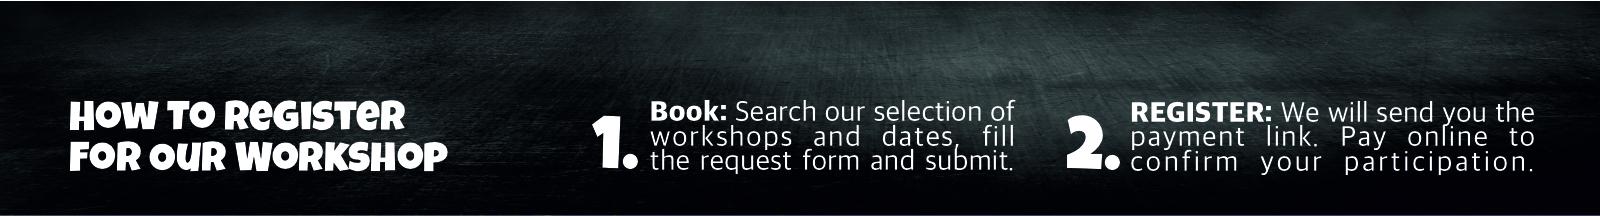 howtobookworkshop.jpg